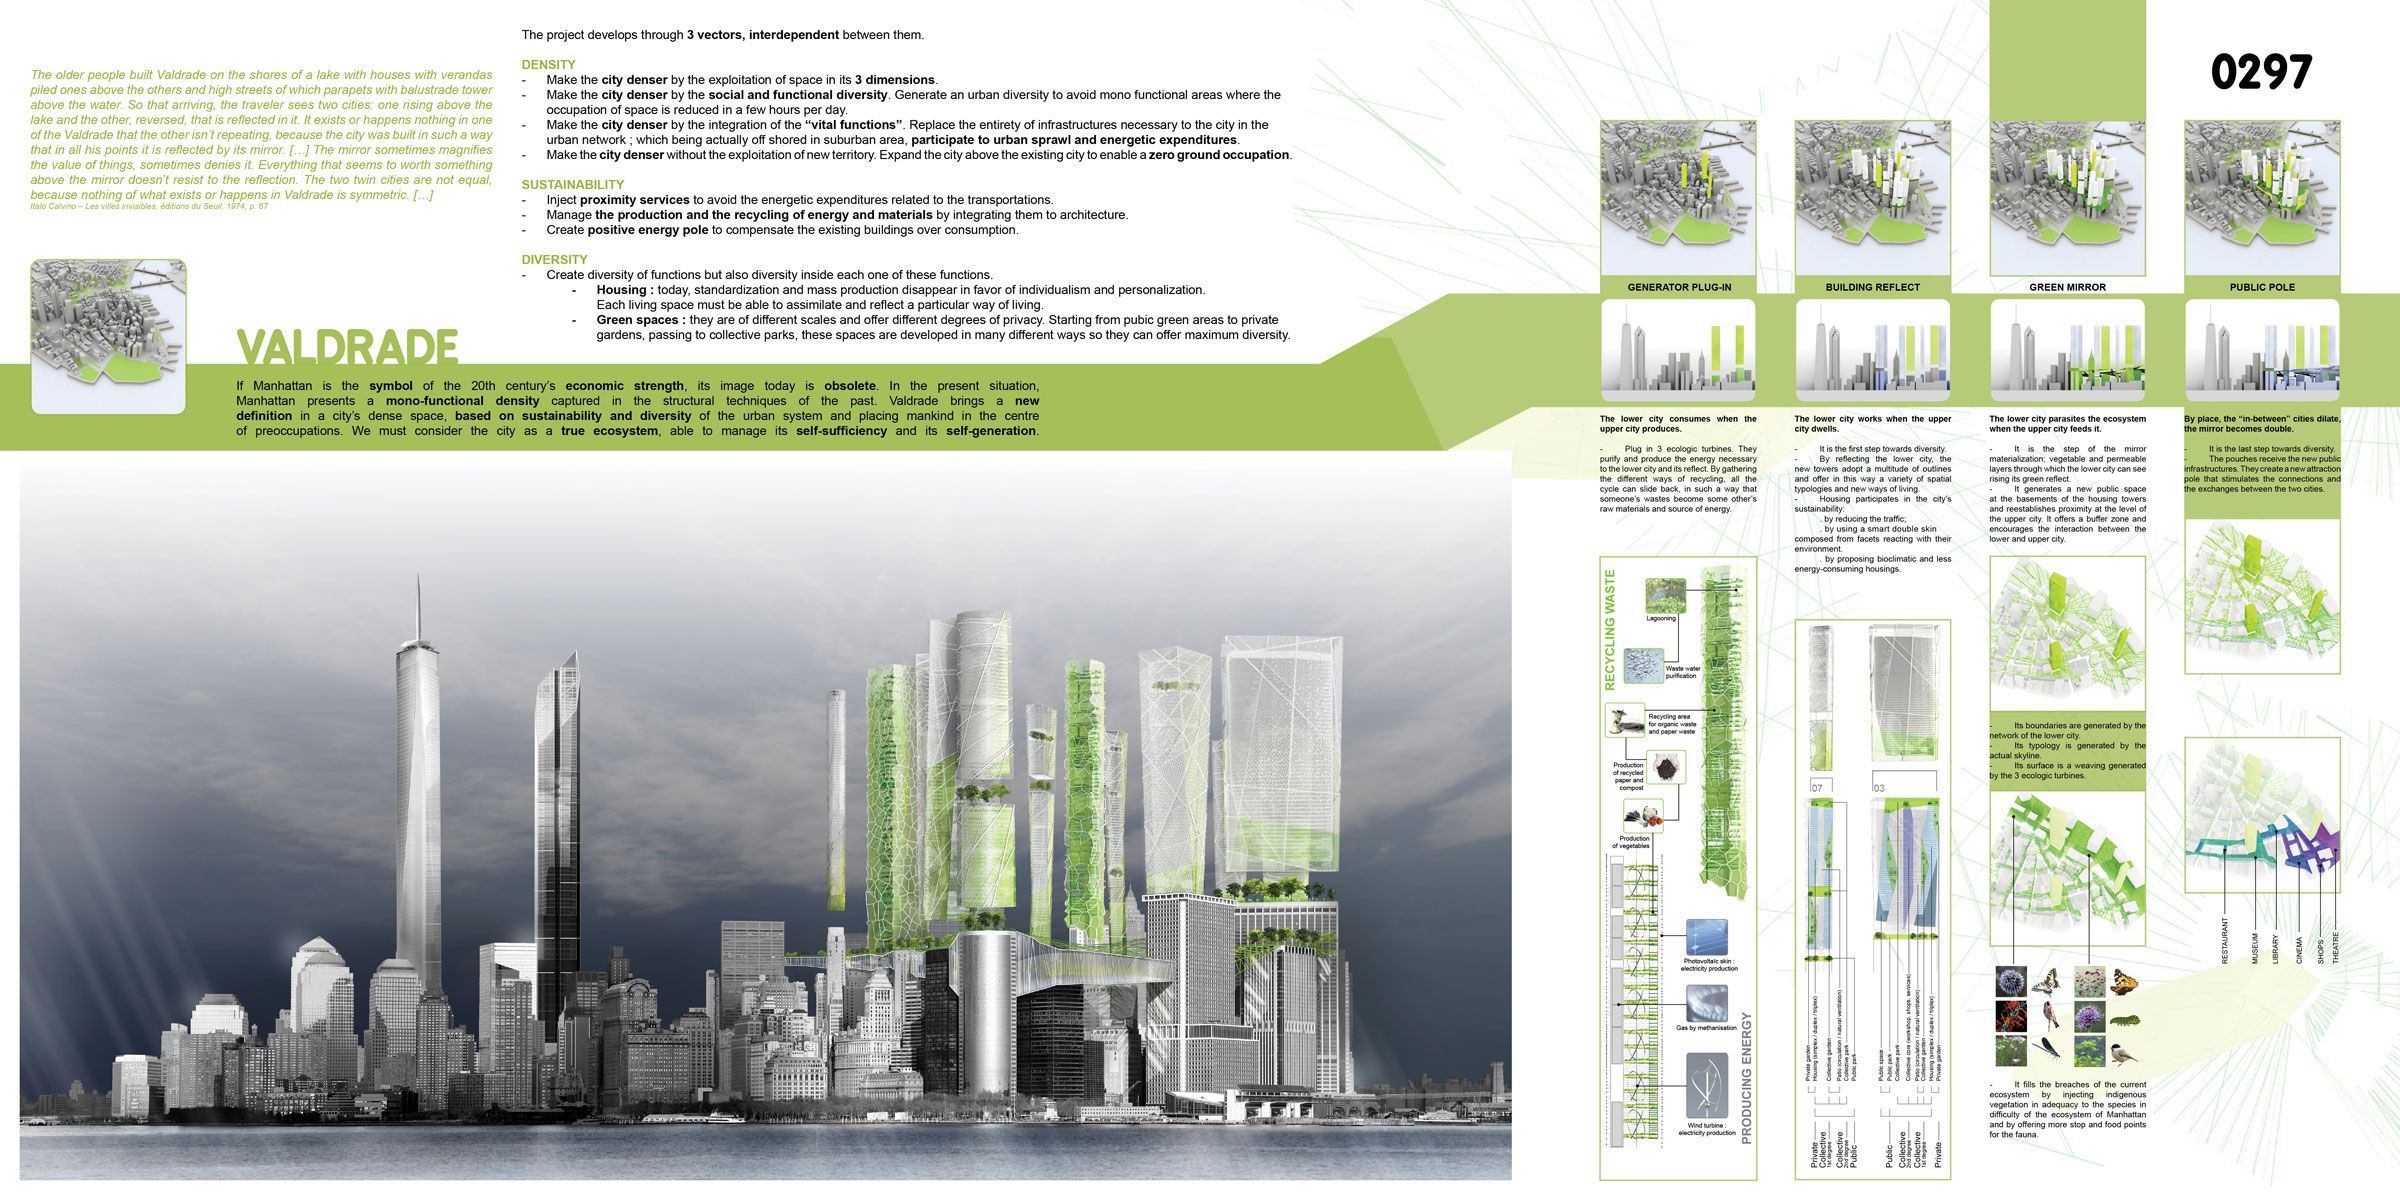 Architectural Drawings Of Skyscrapers skyscraper skin | skyscraper ecosystem in manhattan – valdrade